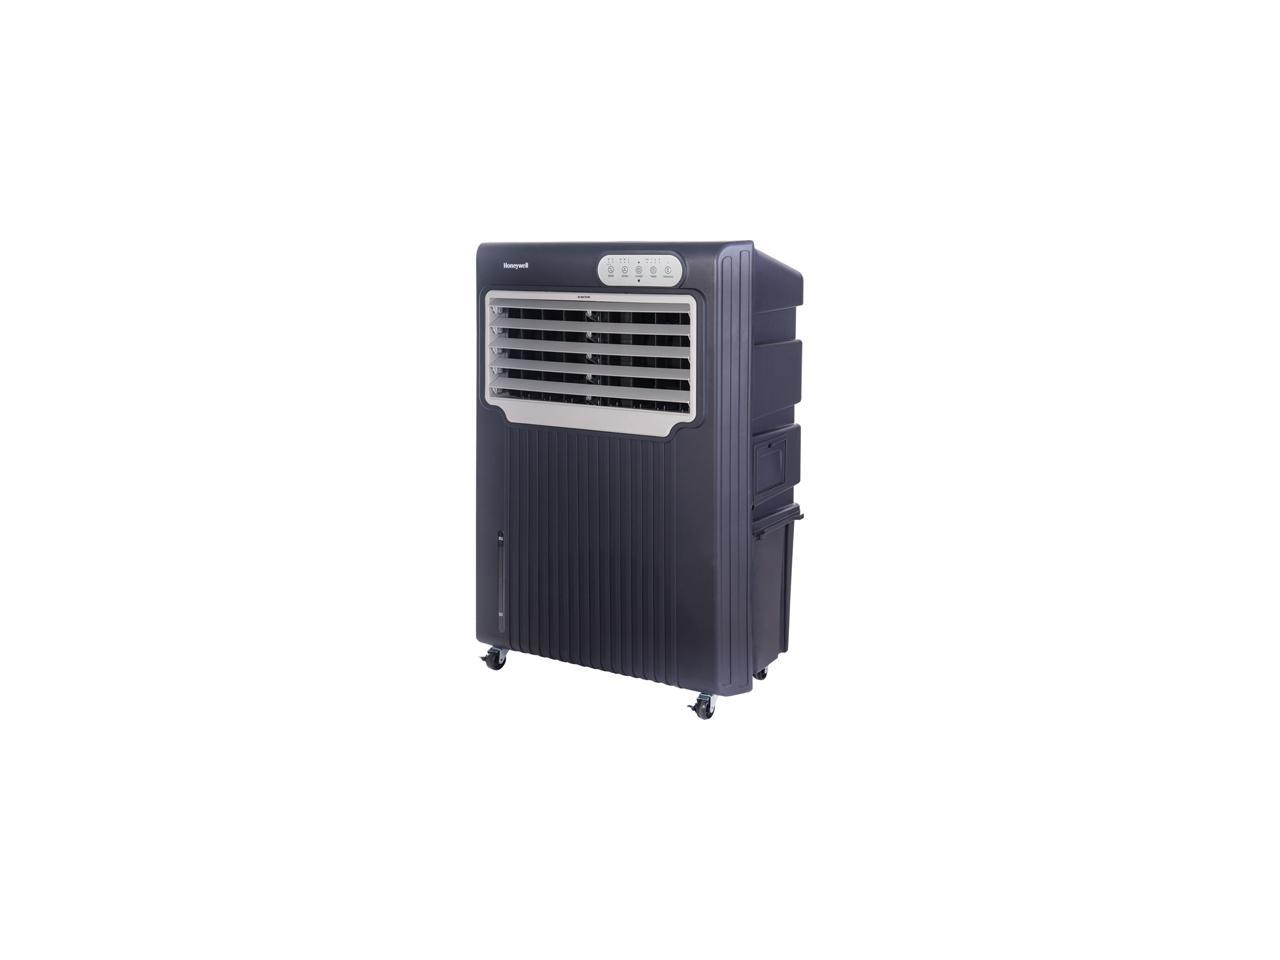 Honeywell CO70PE 70 Liter Outdoor Portable Evaporative Air ...